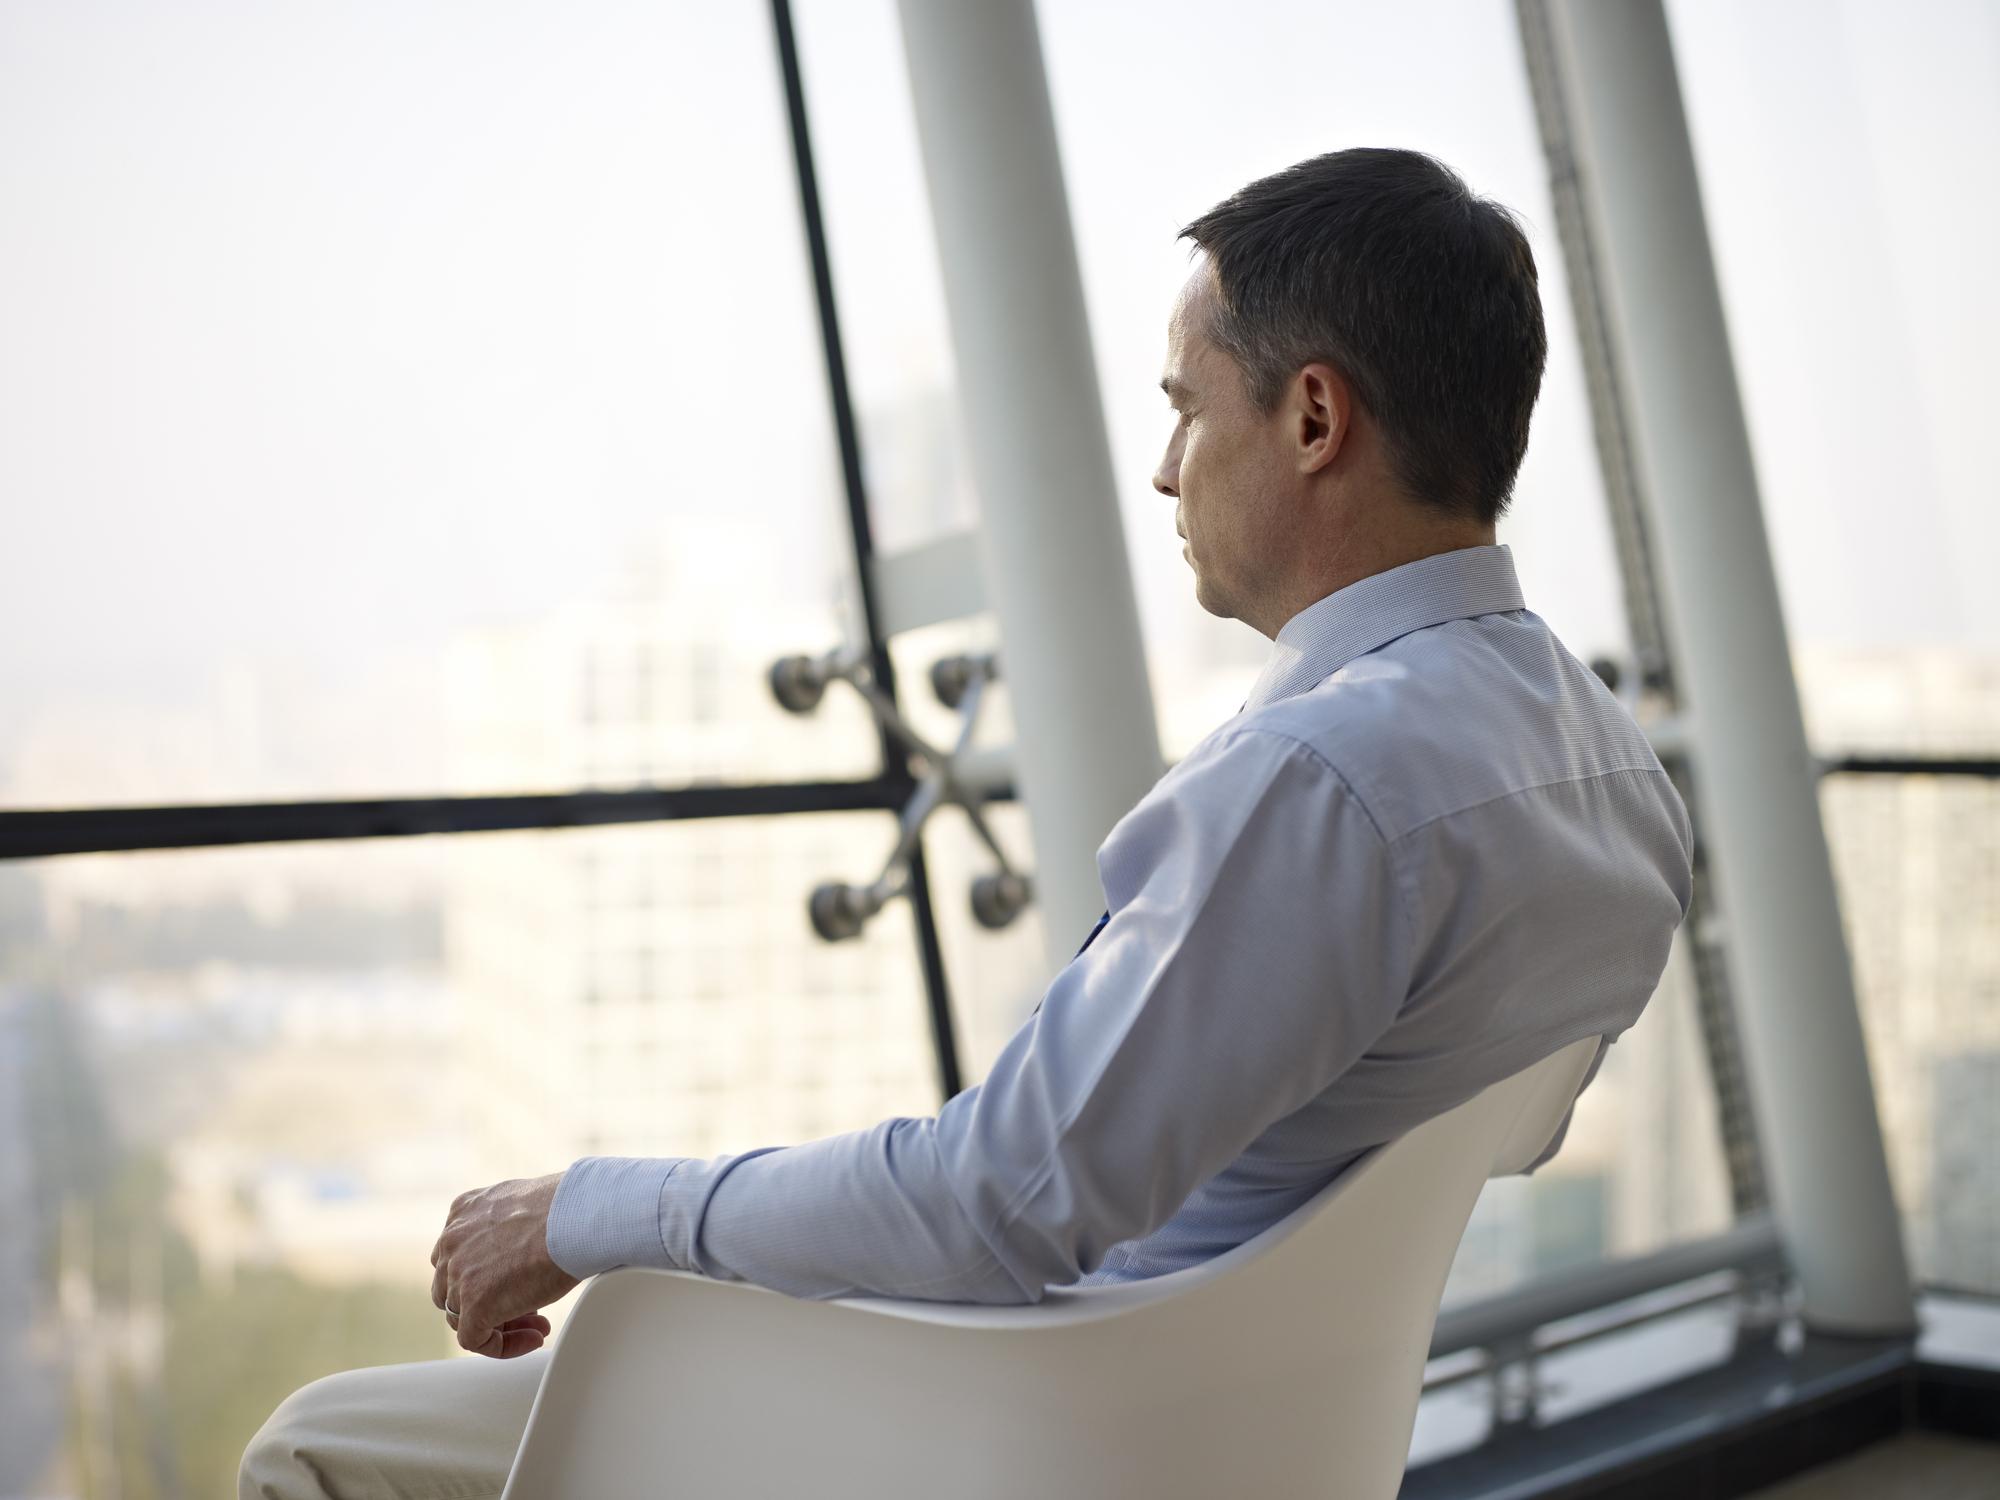 Contemplating cx failure